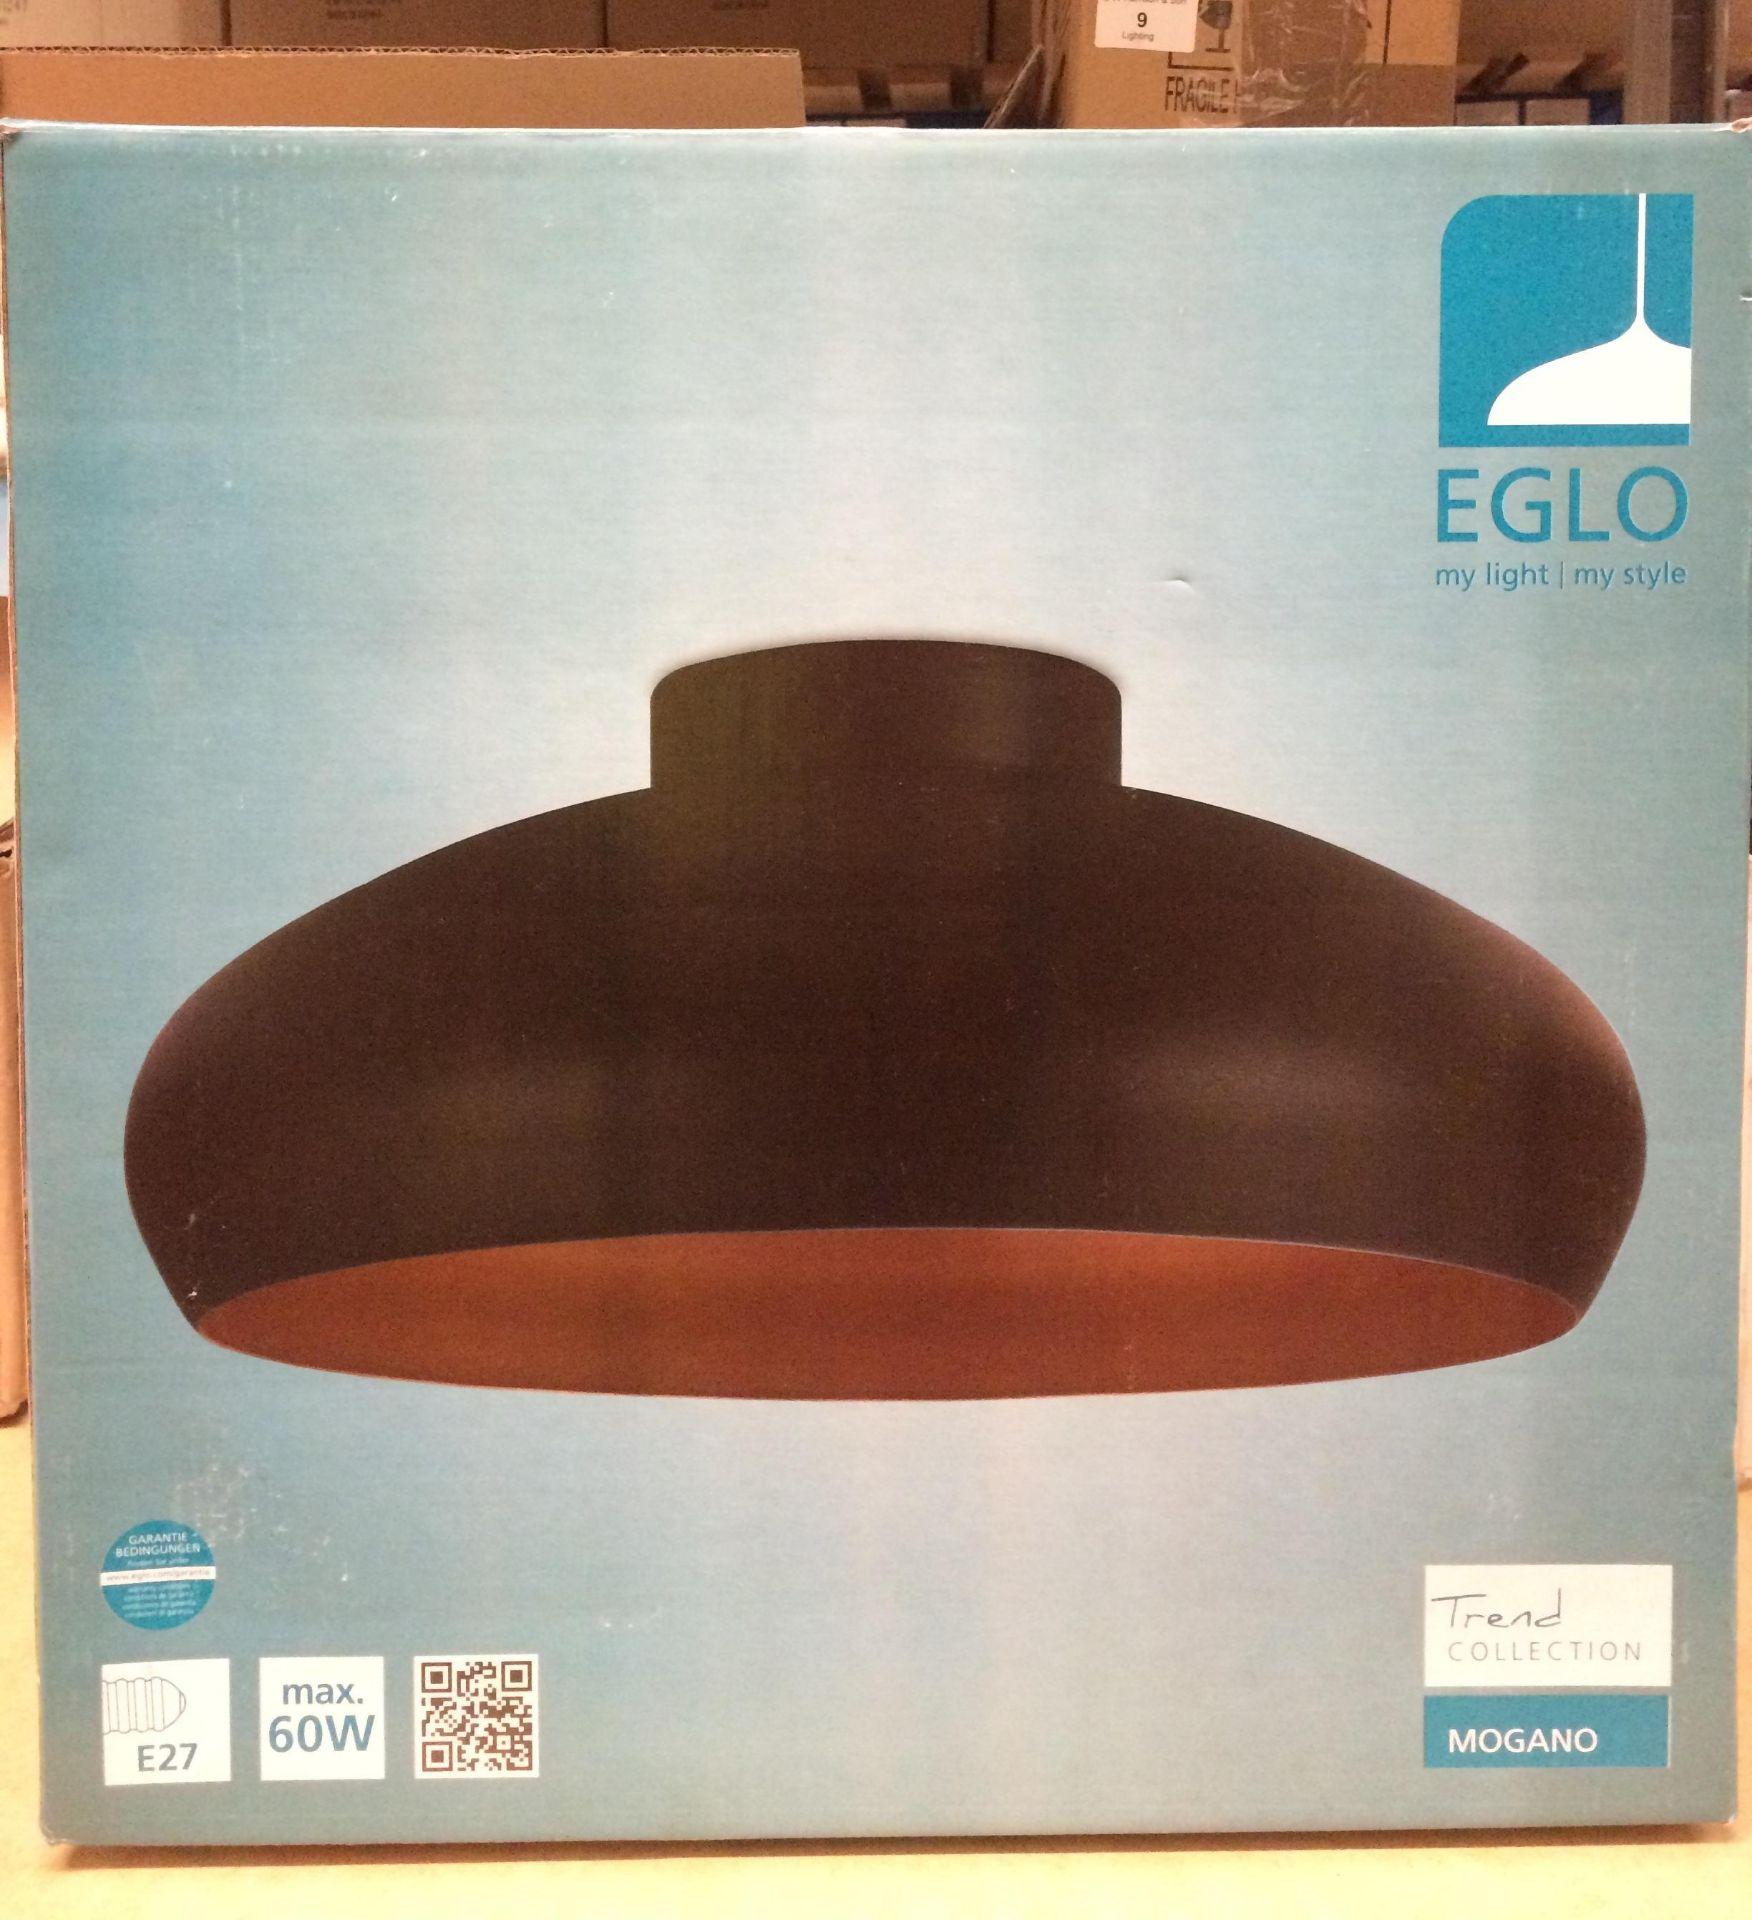 Eglo Mogano 1-Light Semi Flush Mount